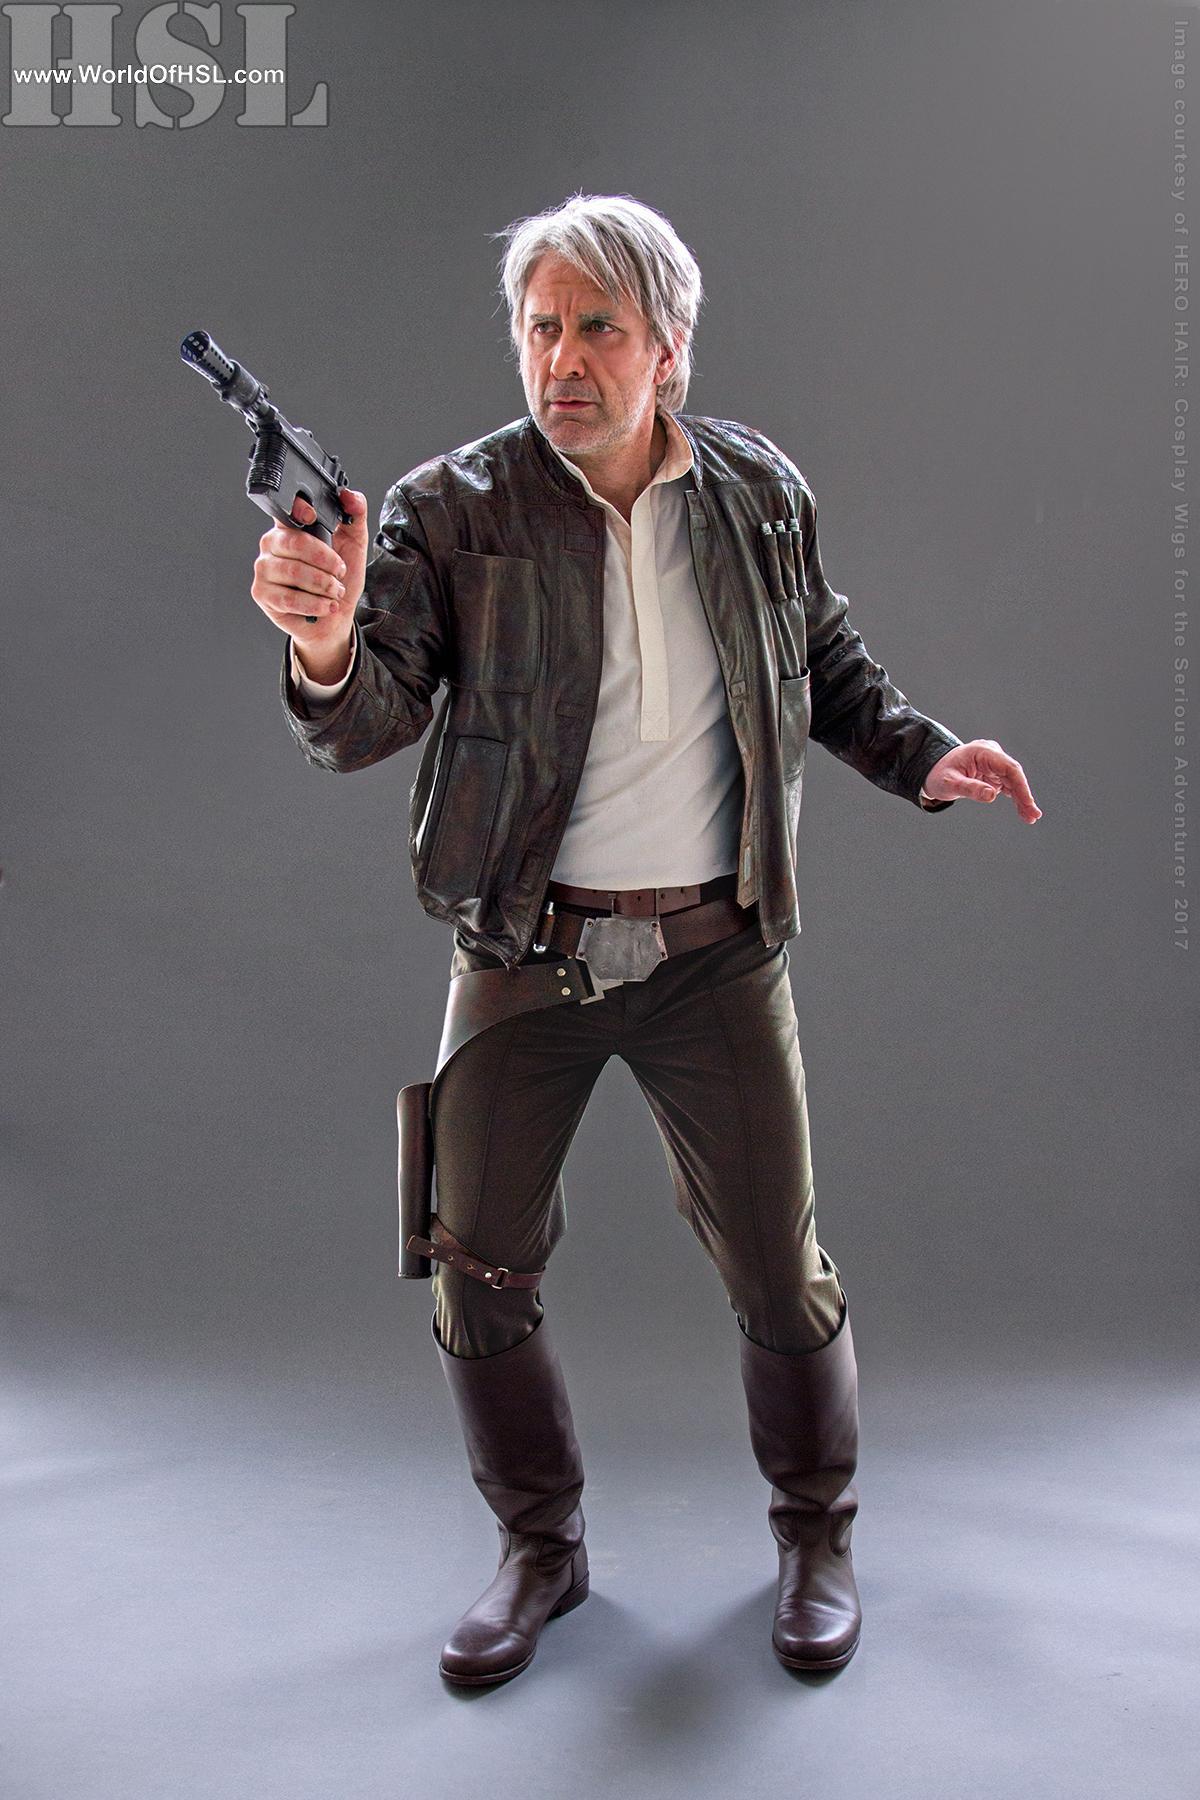 This Force Awakens Era Han Solo Is Dead On  Adafruit Industries  Makers hackers artists